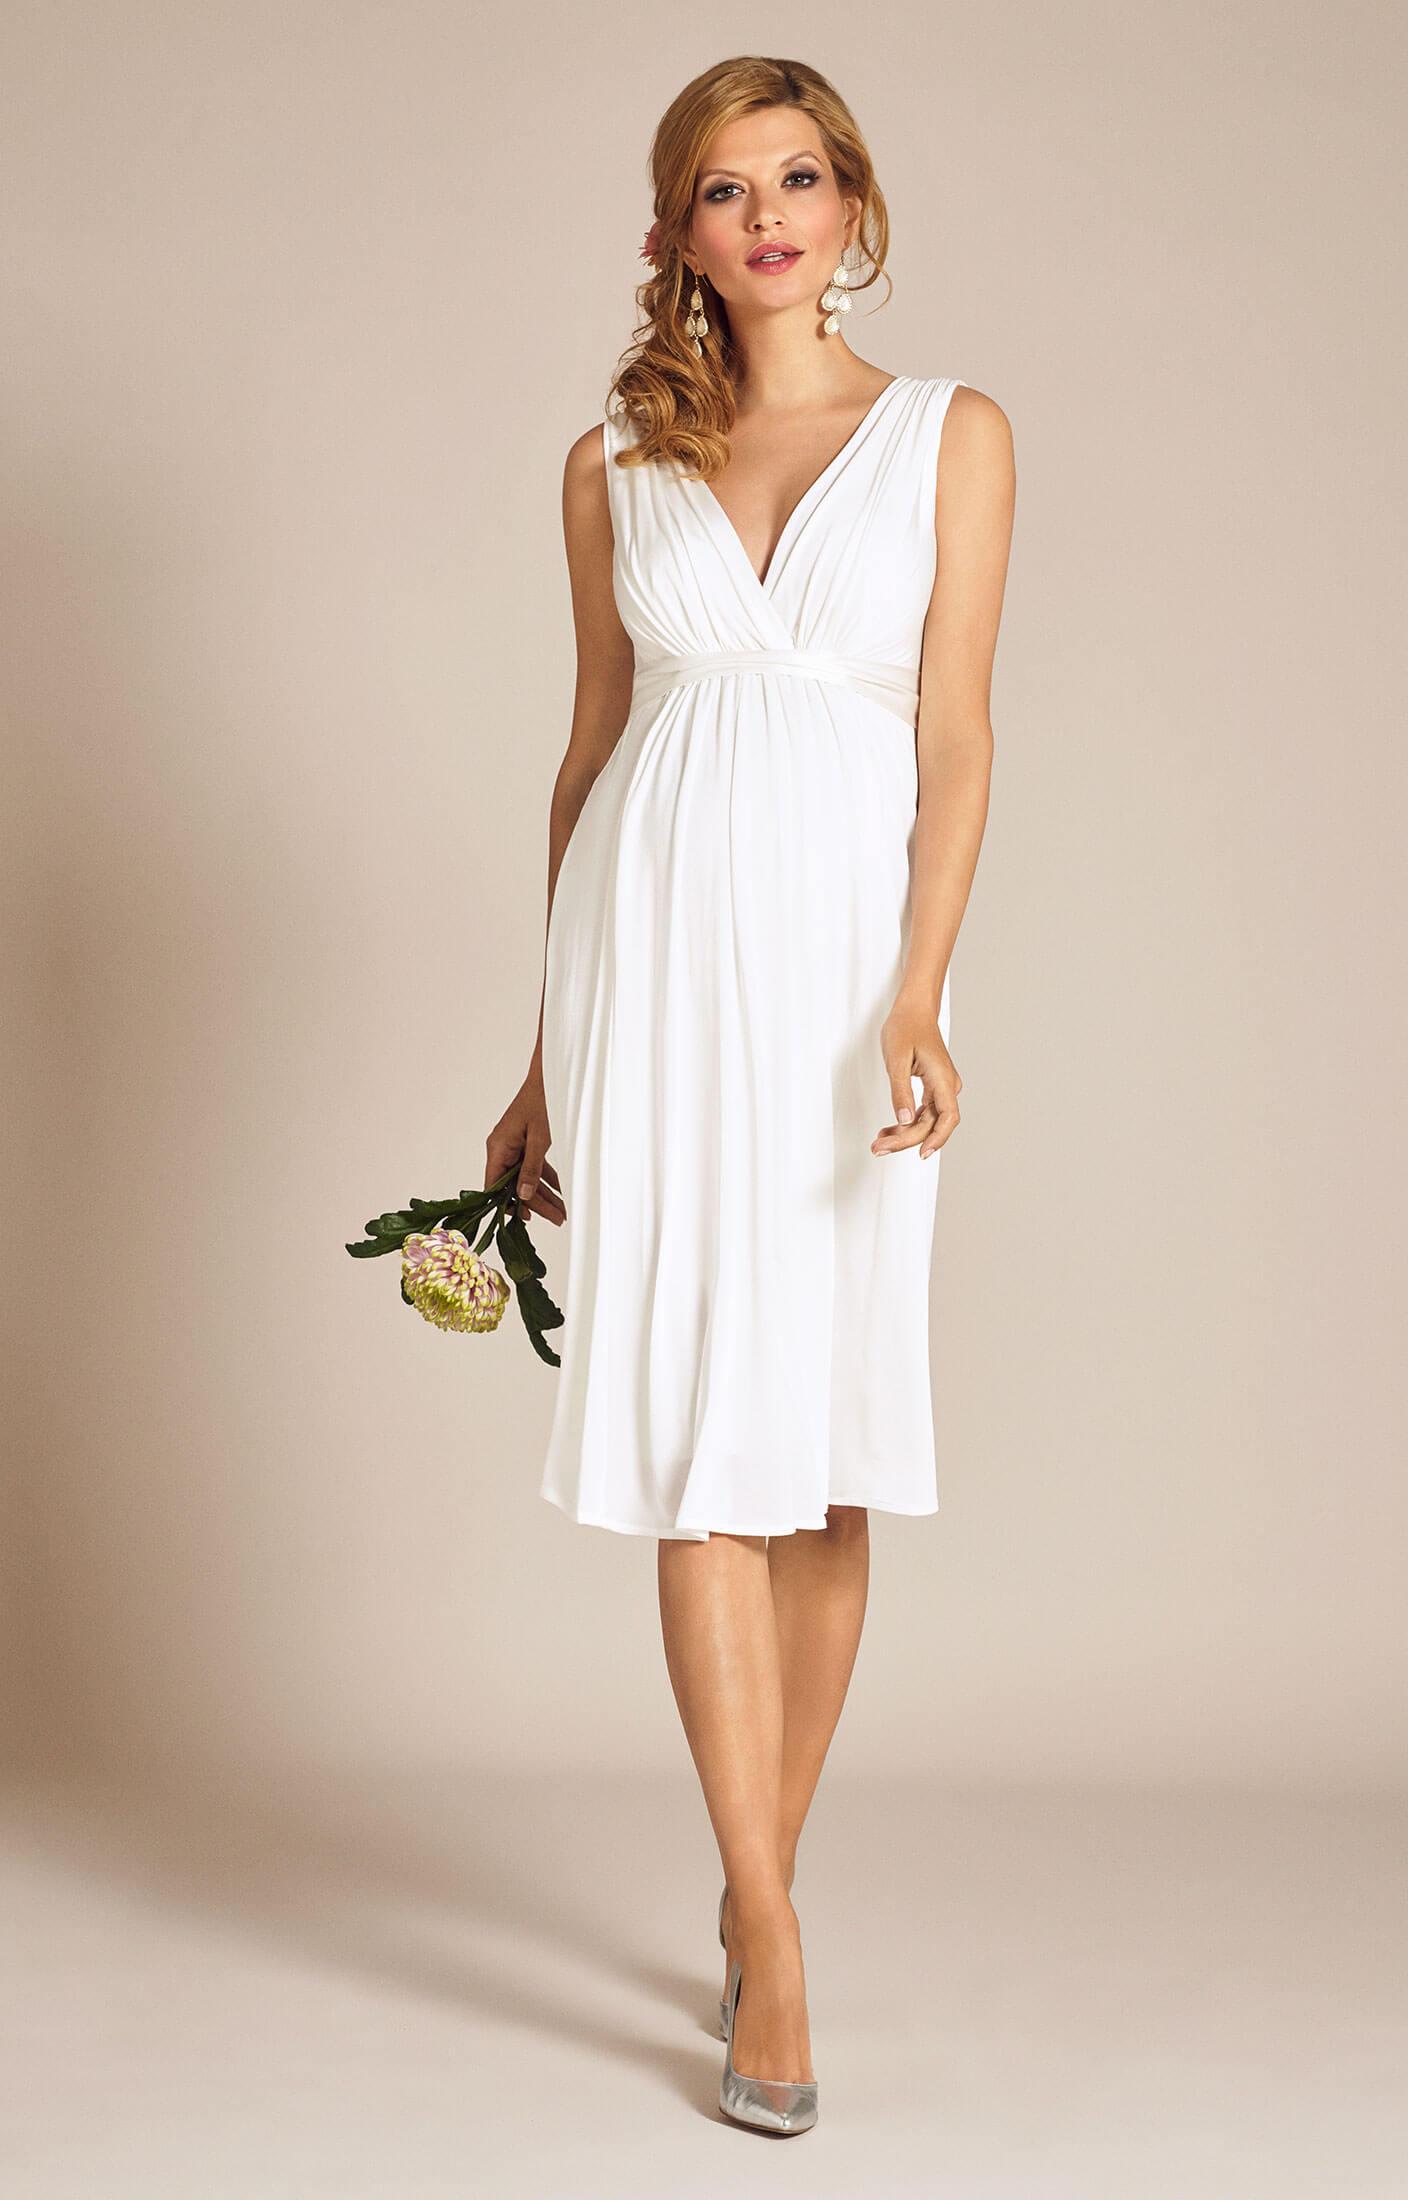 Anastasia Maternity Wedding Dress Short Ivory  Maternity Wedding Dresses Evening Wear and